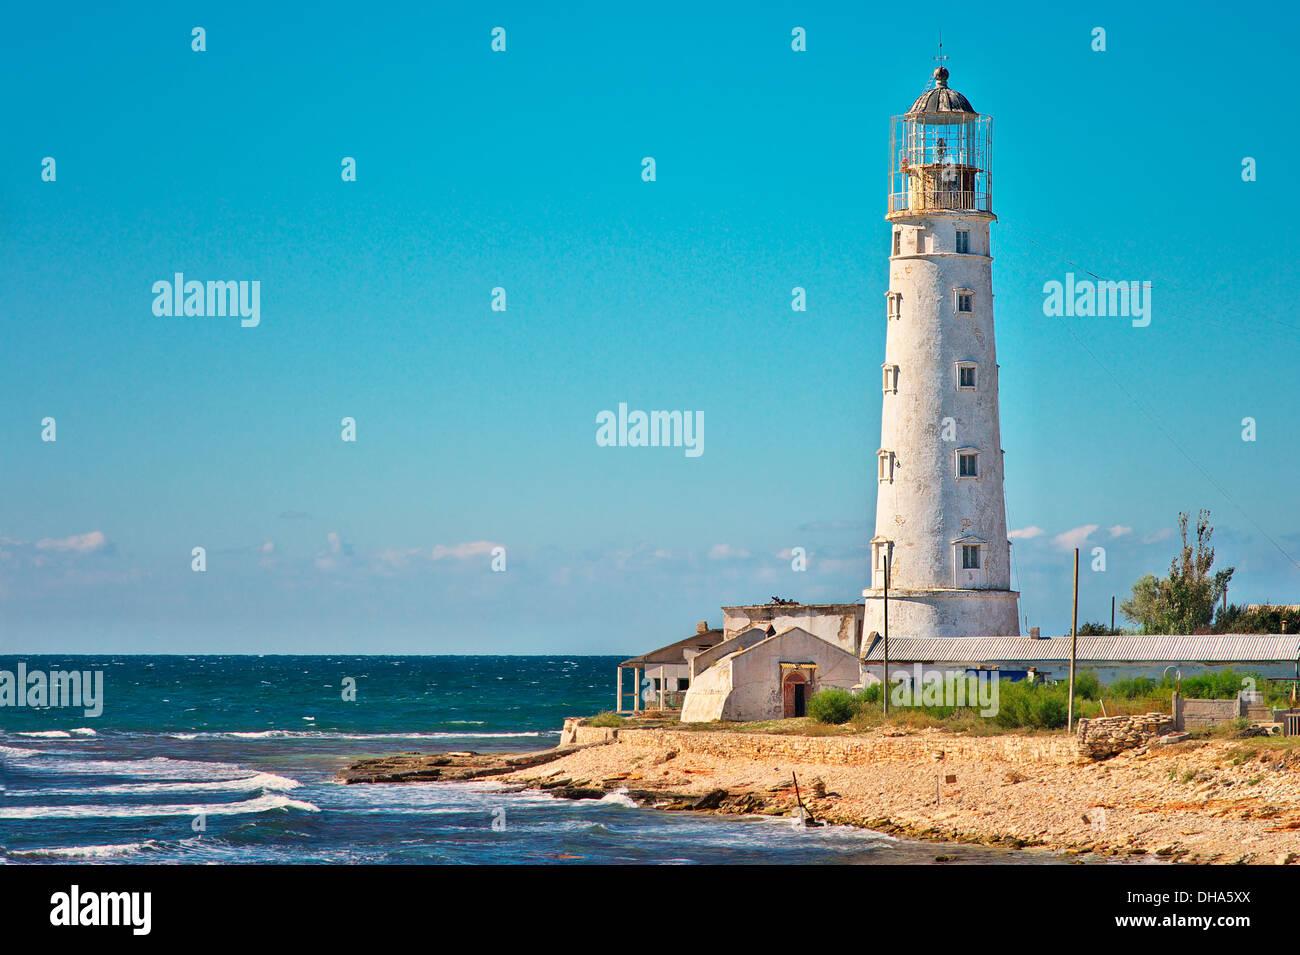 Lighthouse Building on seaside with Blue Sky on Background Landmark of Tarhankut, Crimea, Ukraine Stock Photo